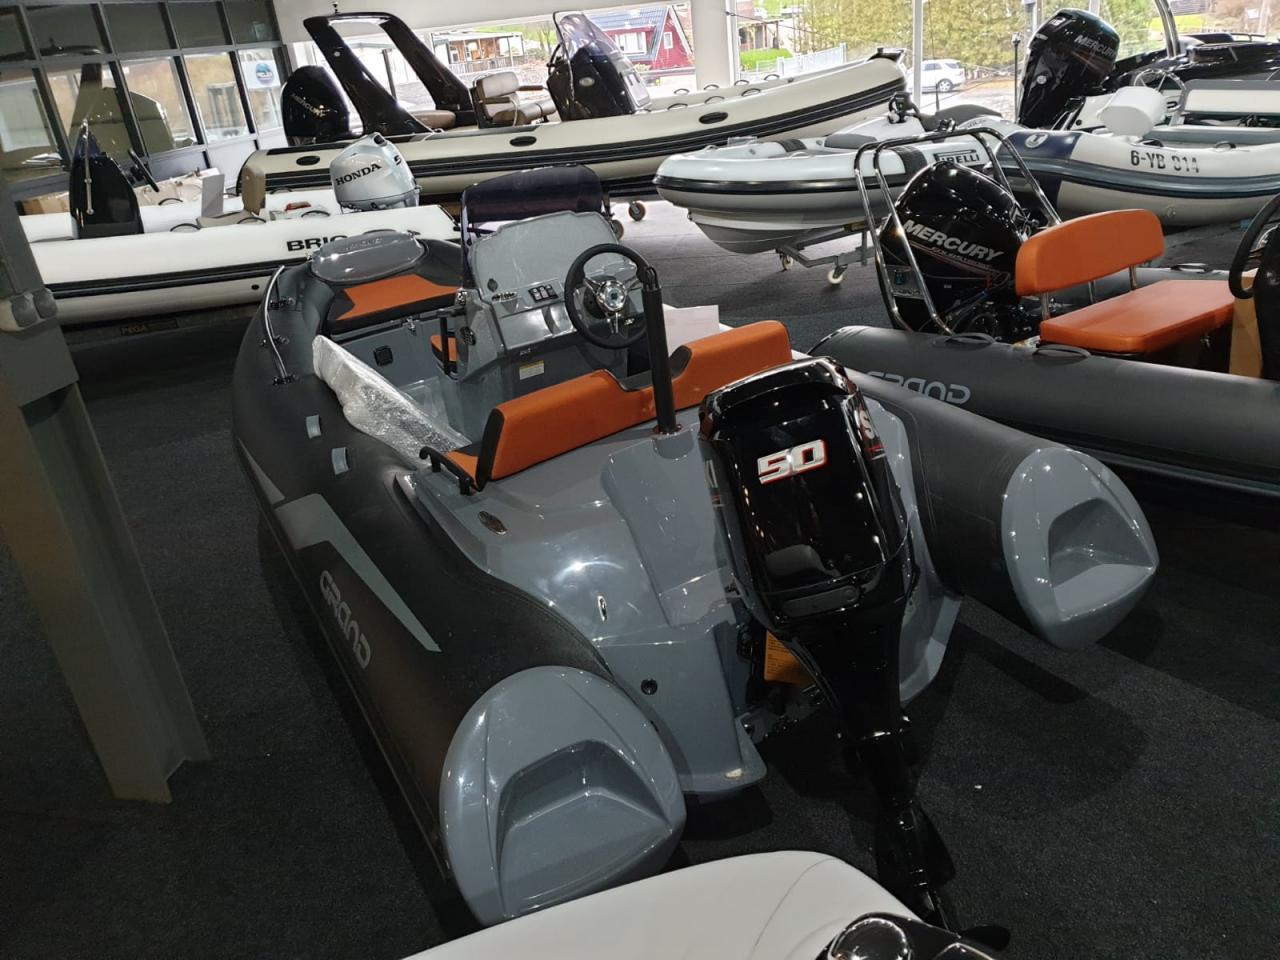 Grand G420LF met Suzuki 60 ATL 2